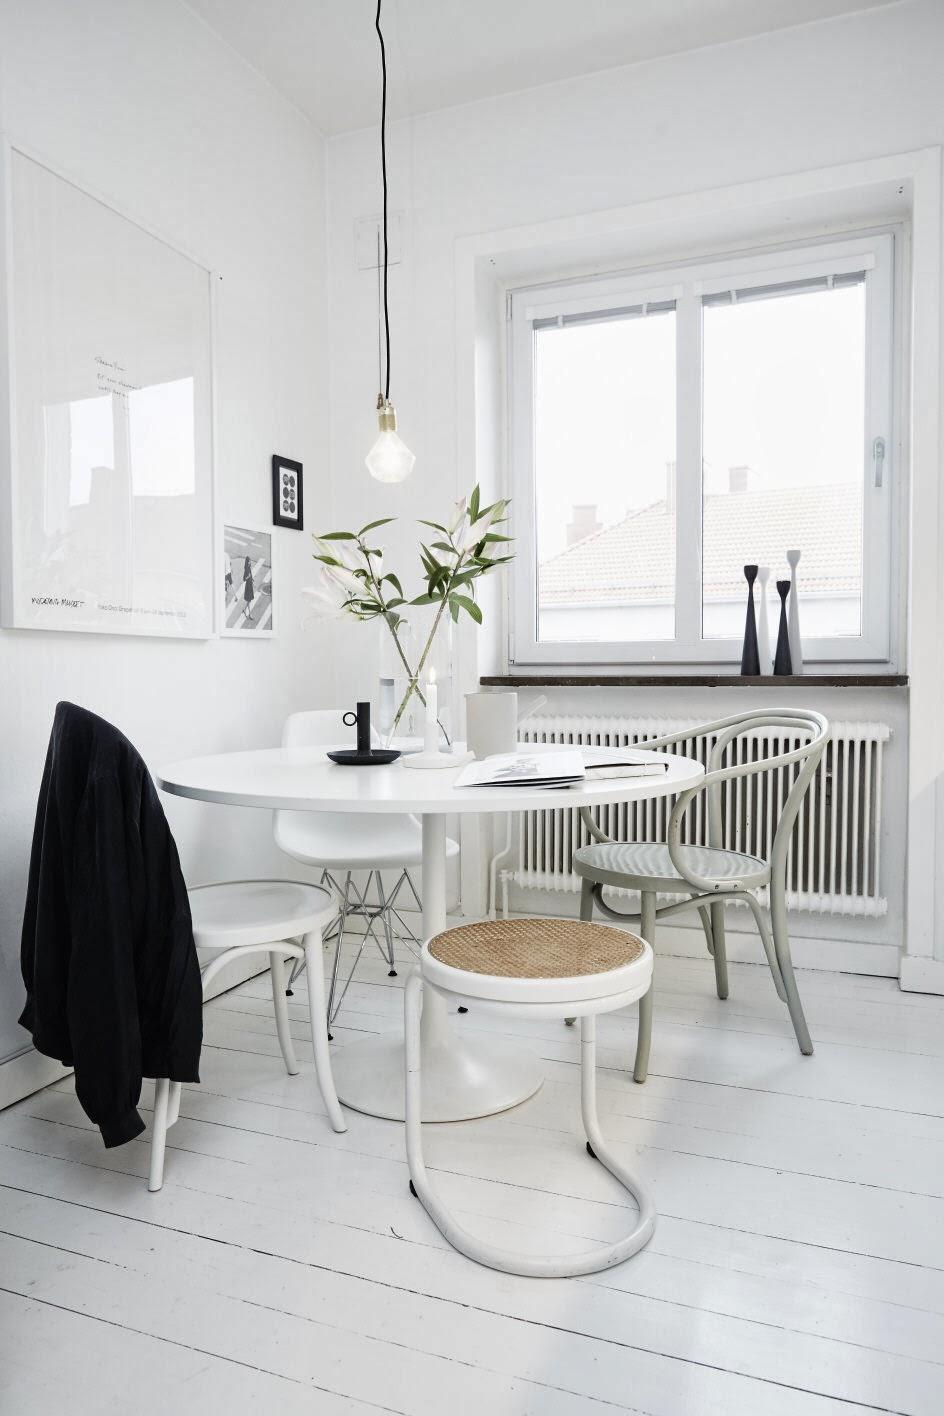 la maison d 39 anna g elin 39 s home. Black Bedroom Furniture Sets. Home Design Ideas